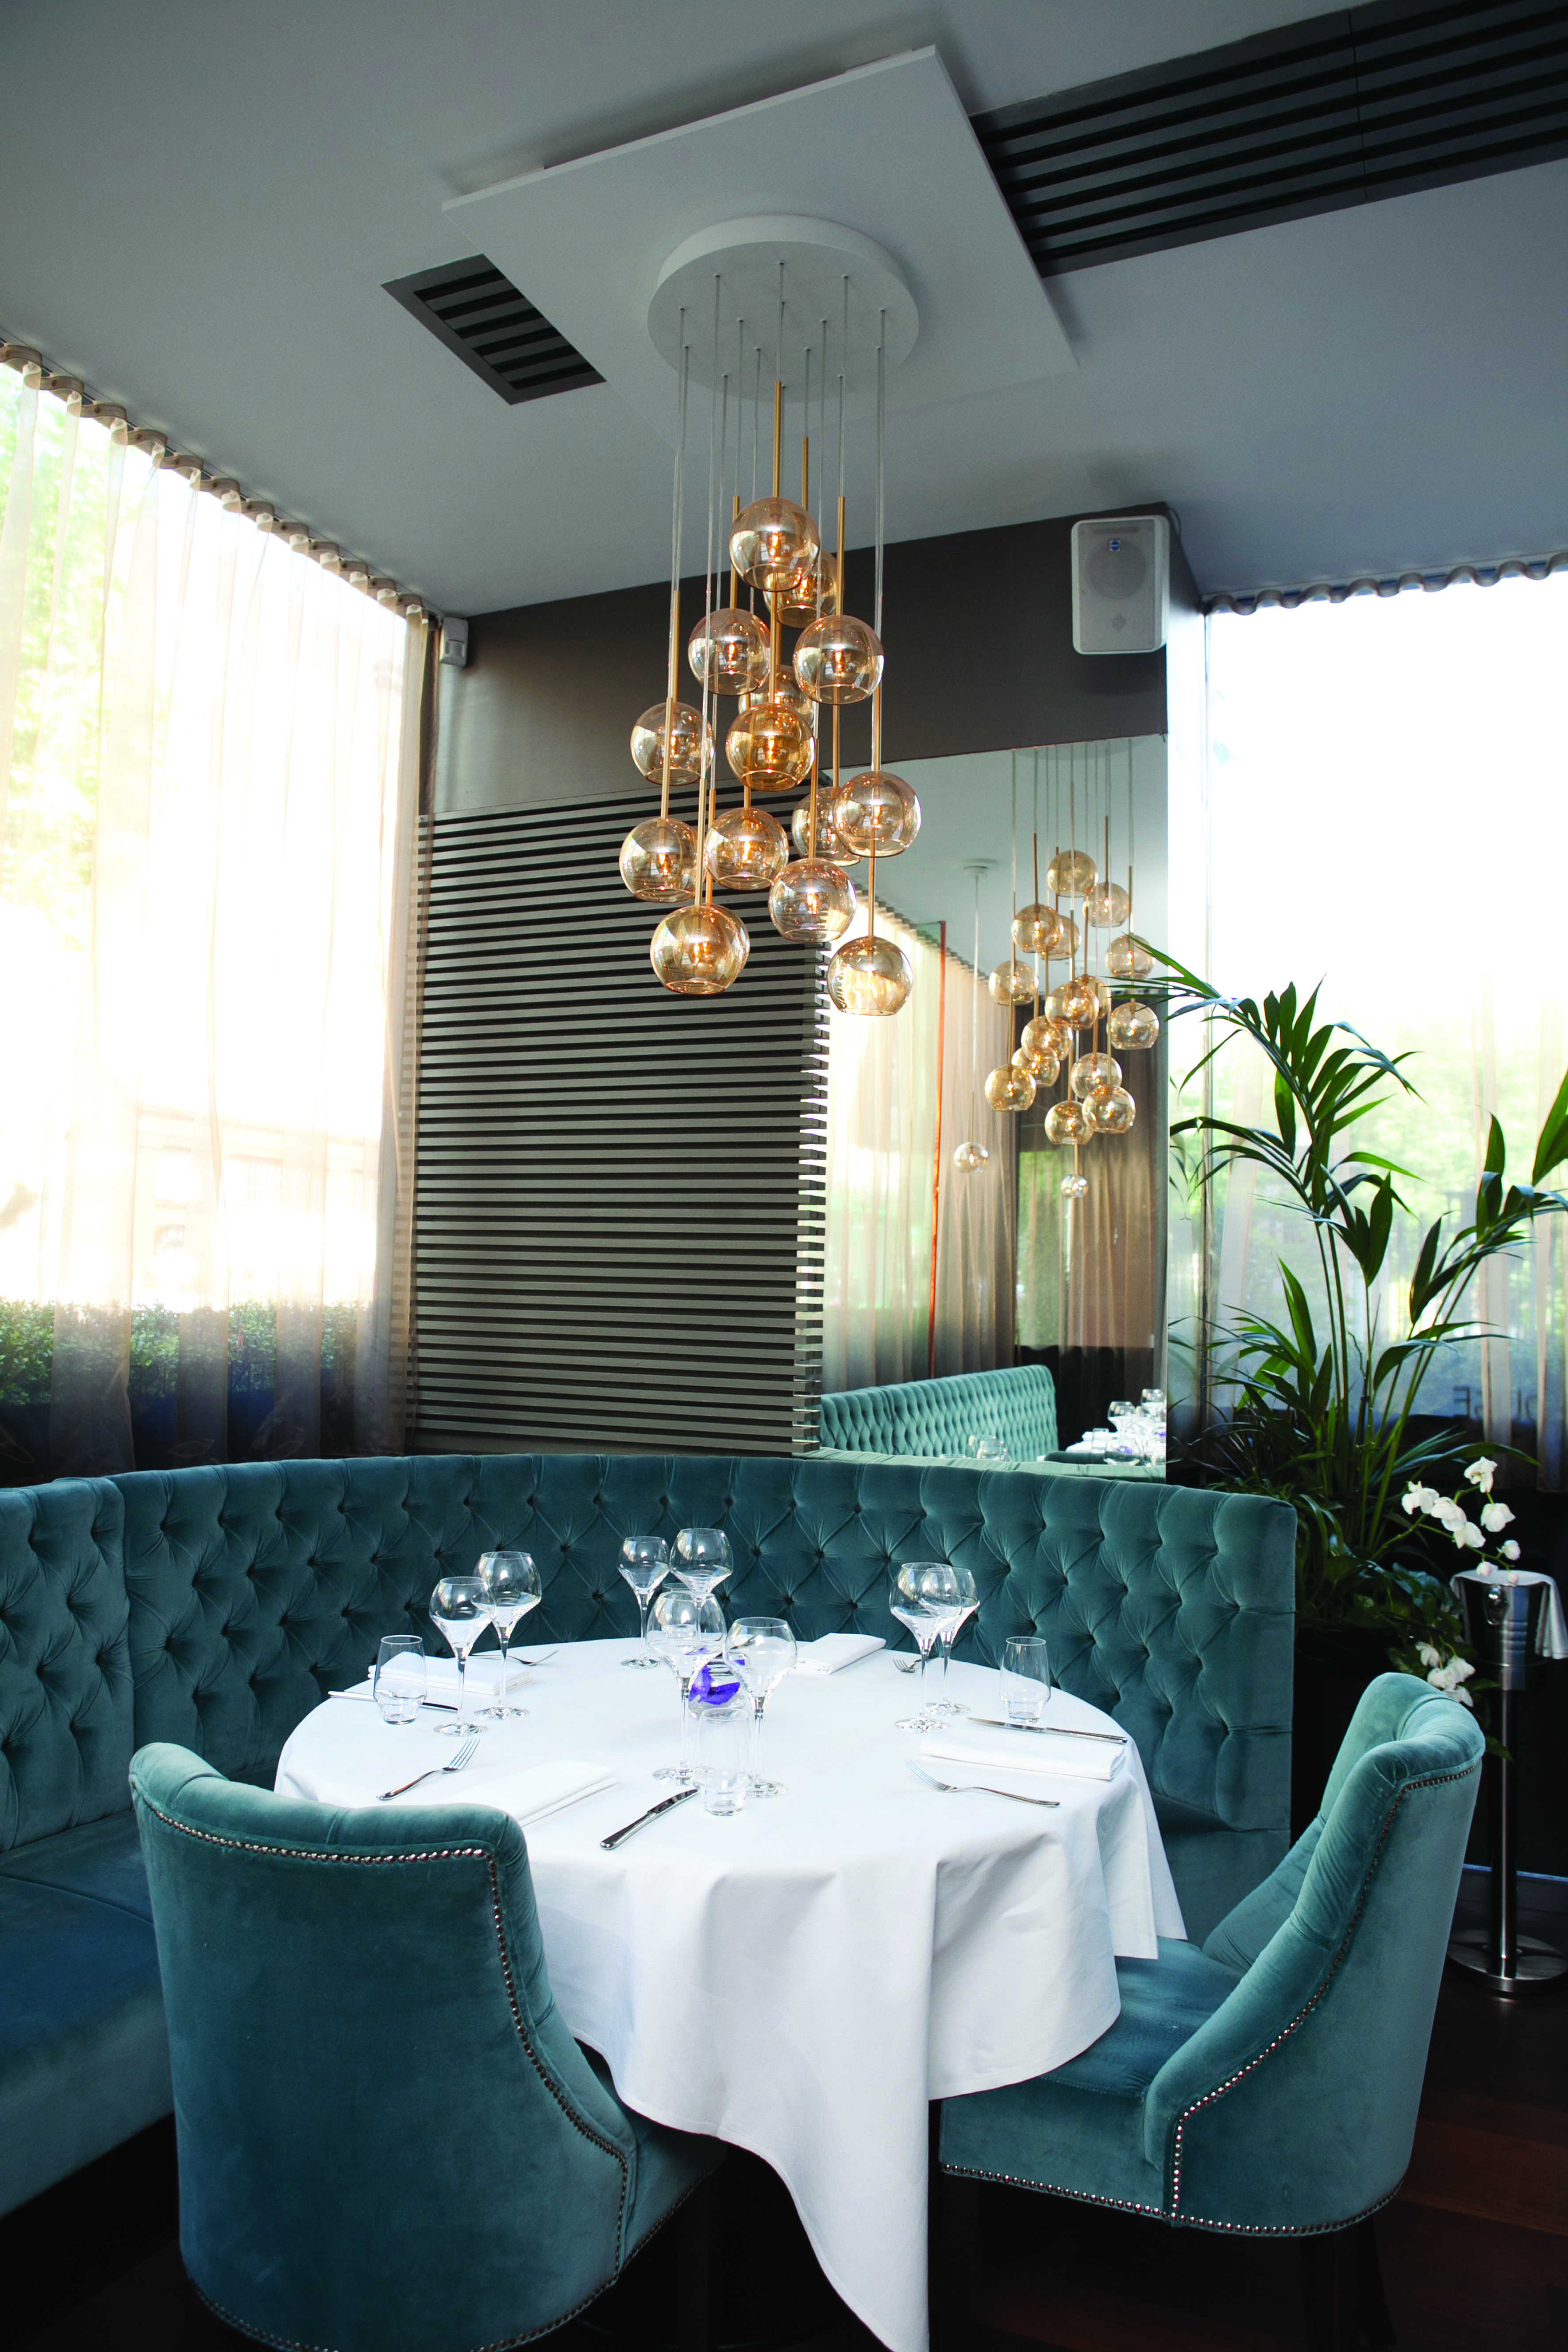 The greenhouse restaurant dublin - The Greenhouse Restaurant Dublin 2